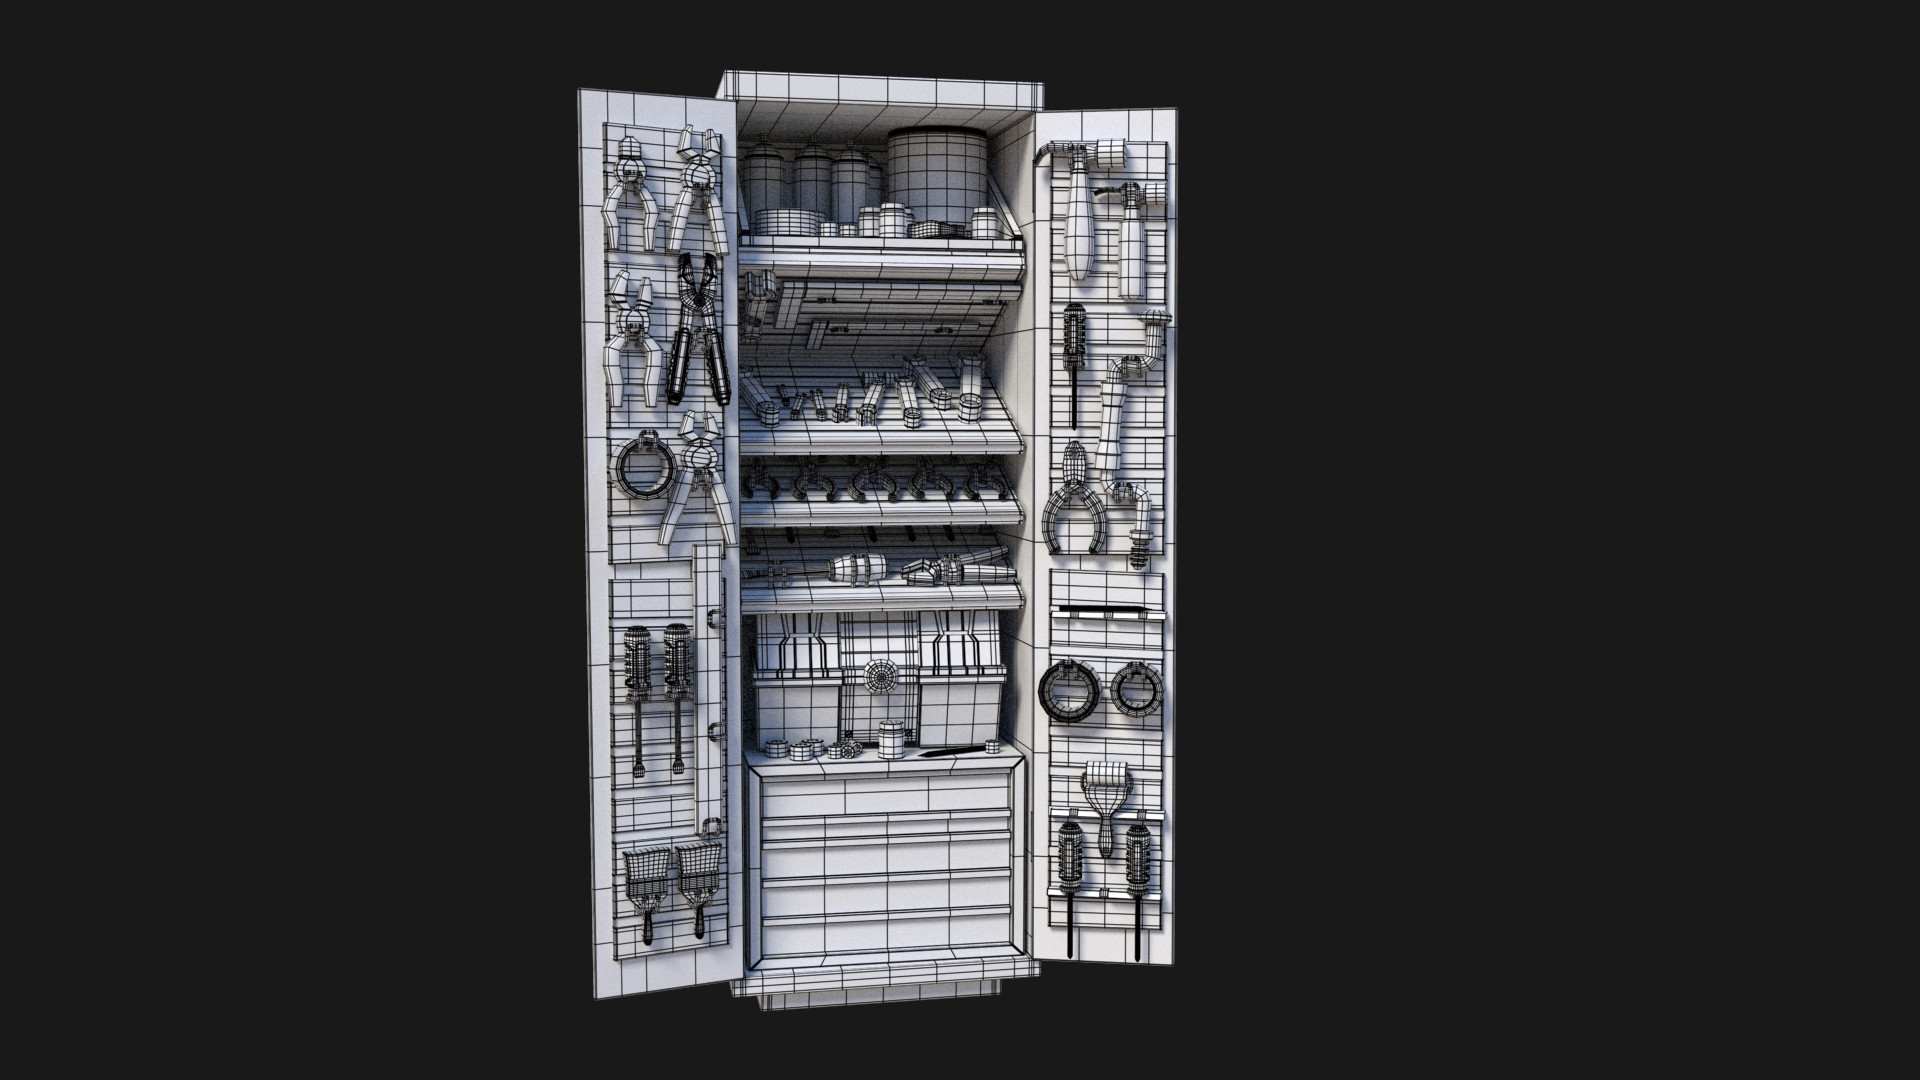 John yau toolcabinet 02 combined